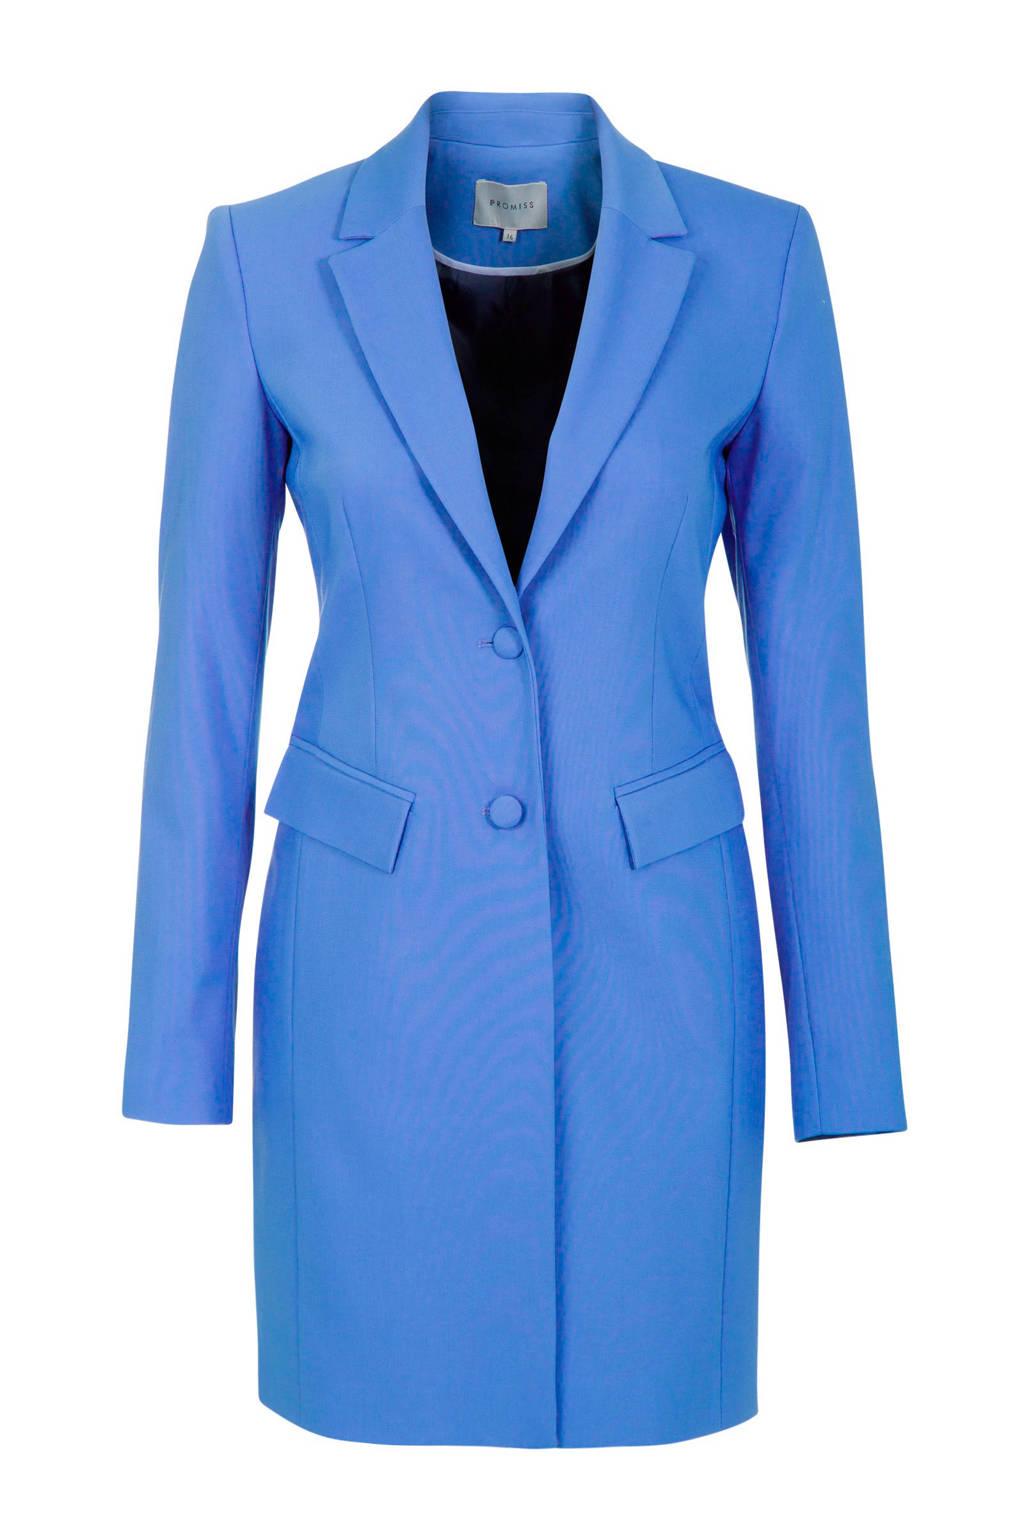 Promisslange Blauw Promisslange Promisslange Blauw Blazer Blazer Blauw Promisslange Blazer w8OPIZ